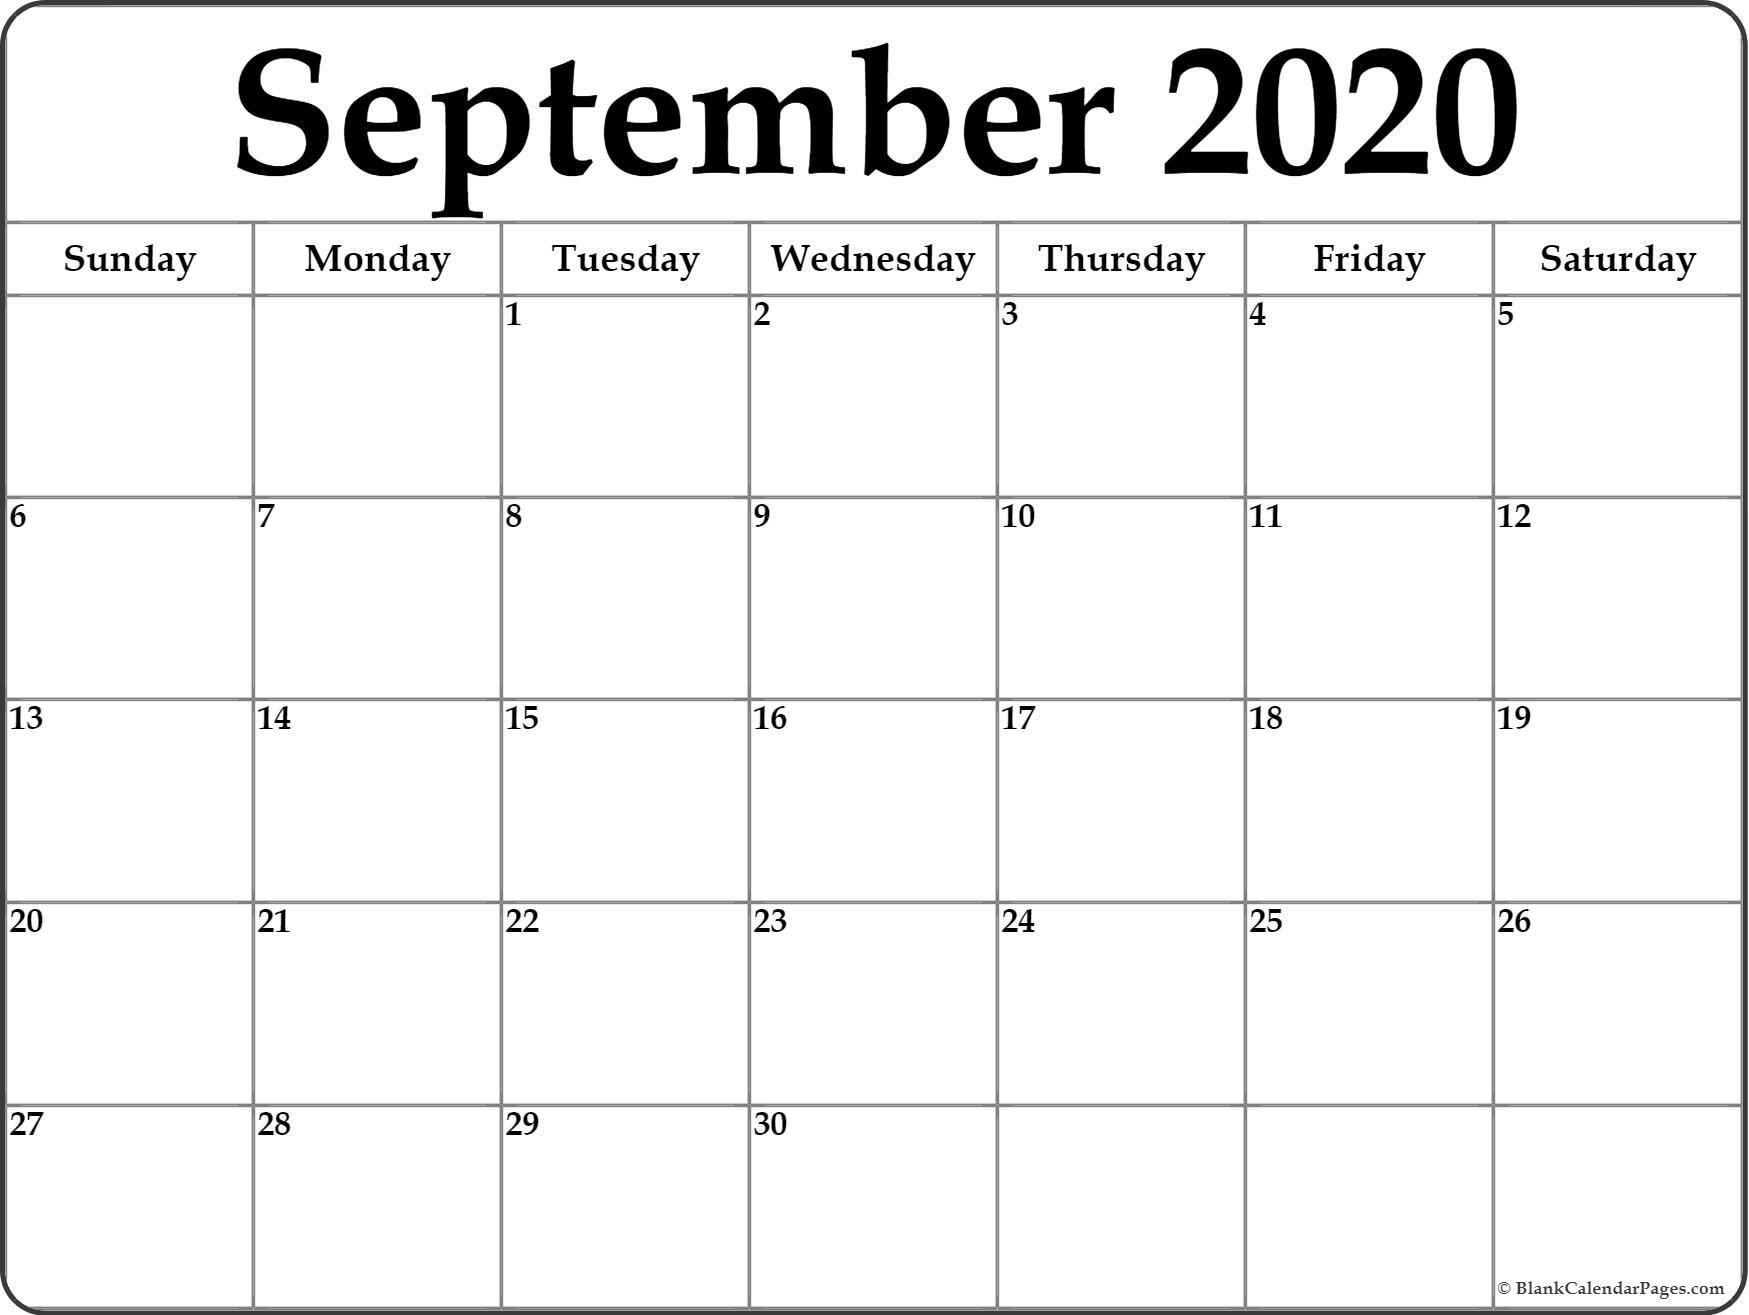 September 2020 Calendar | Free Printable Monthly Calendars-Monday Thru Friday Calendar Template 2020